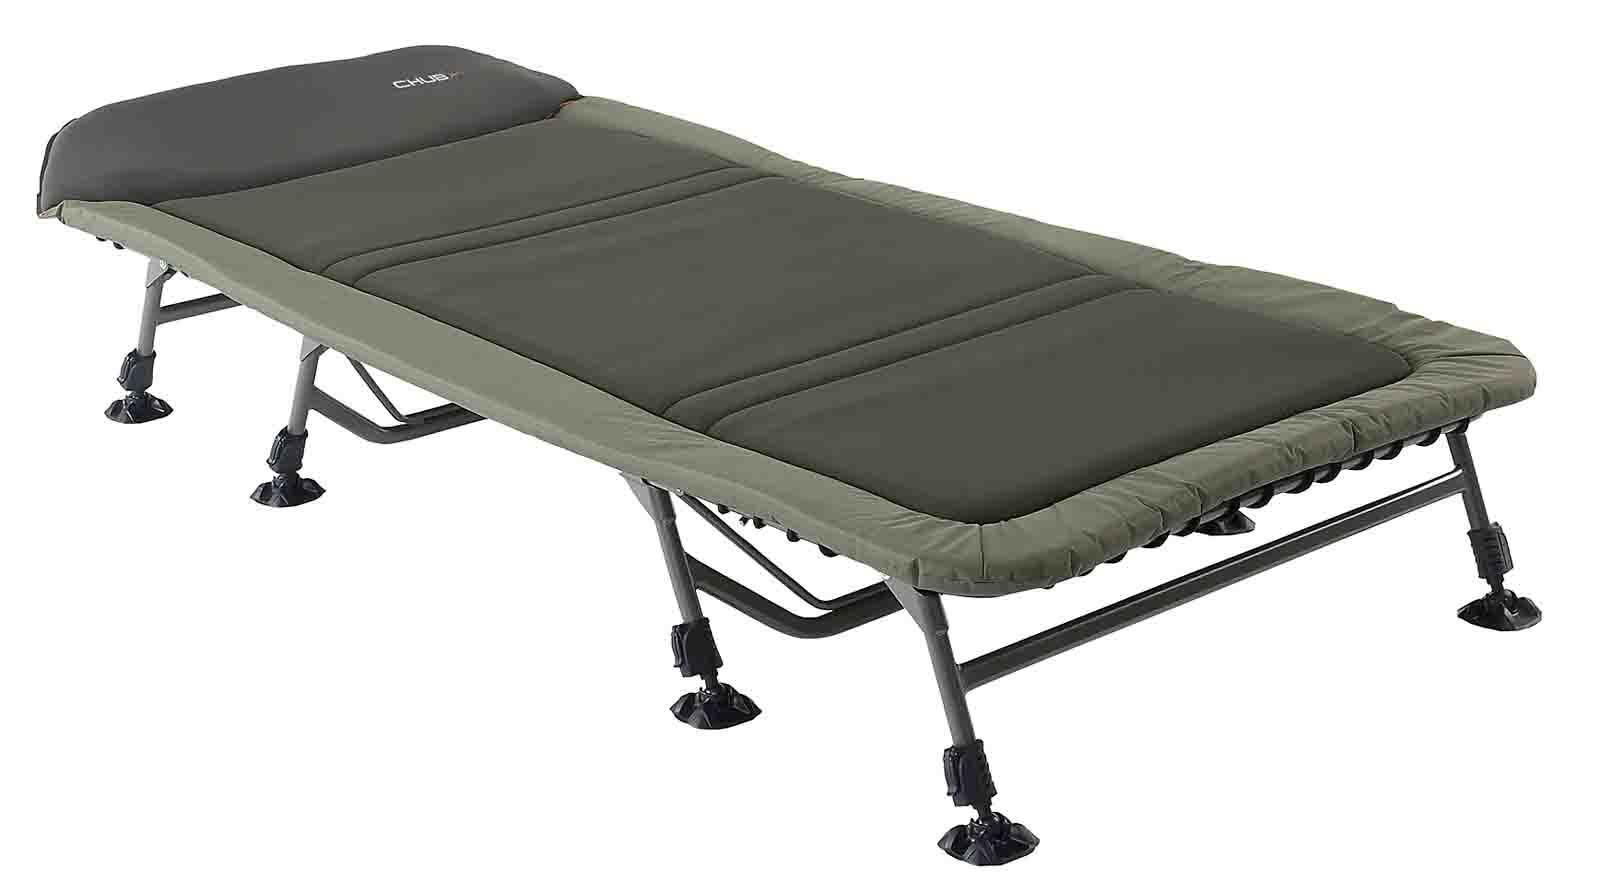 Chub Vantage Flatbed Wide 8 Leg Lightweight Carp Fishing Folding Bedchair